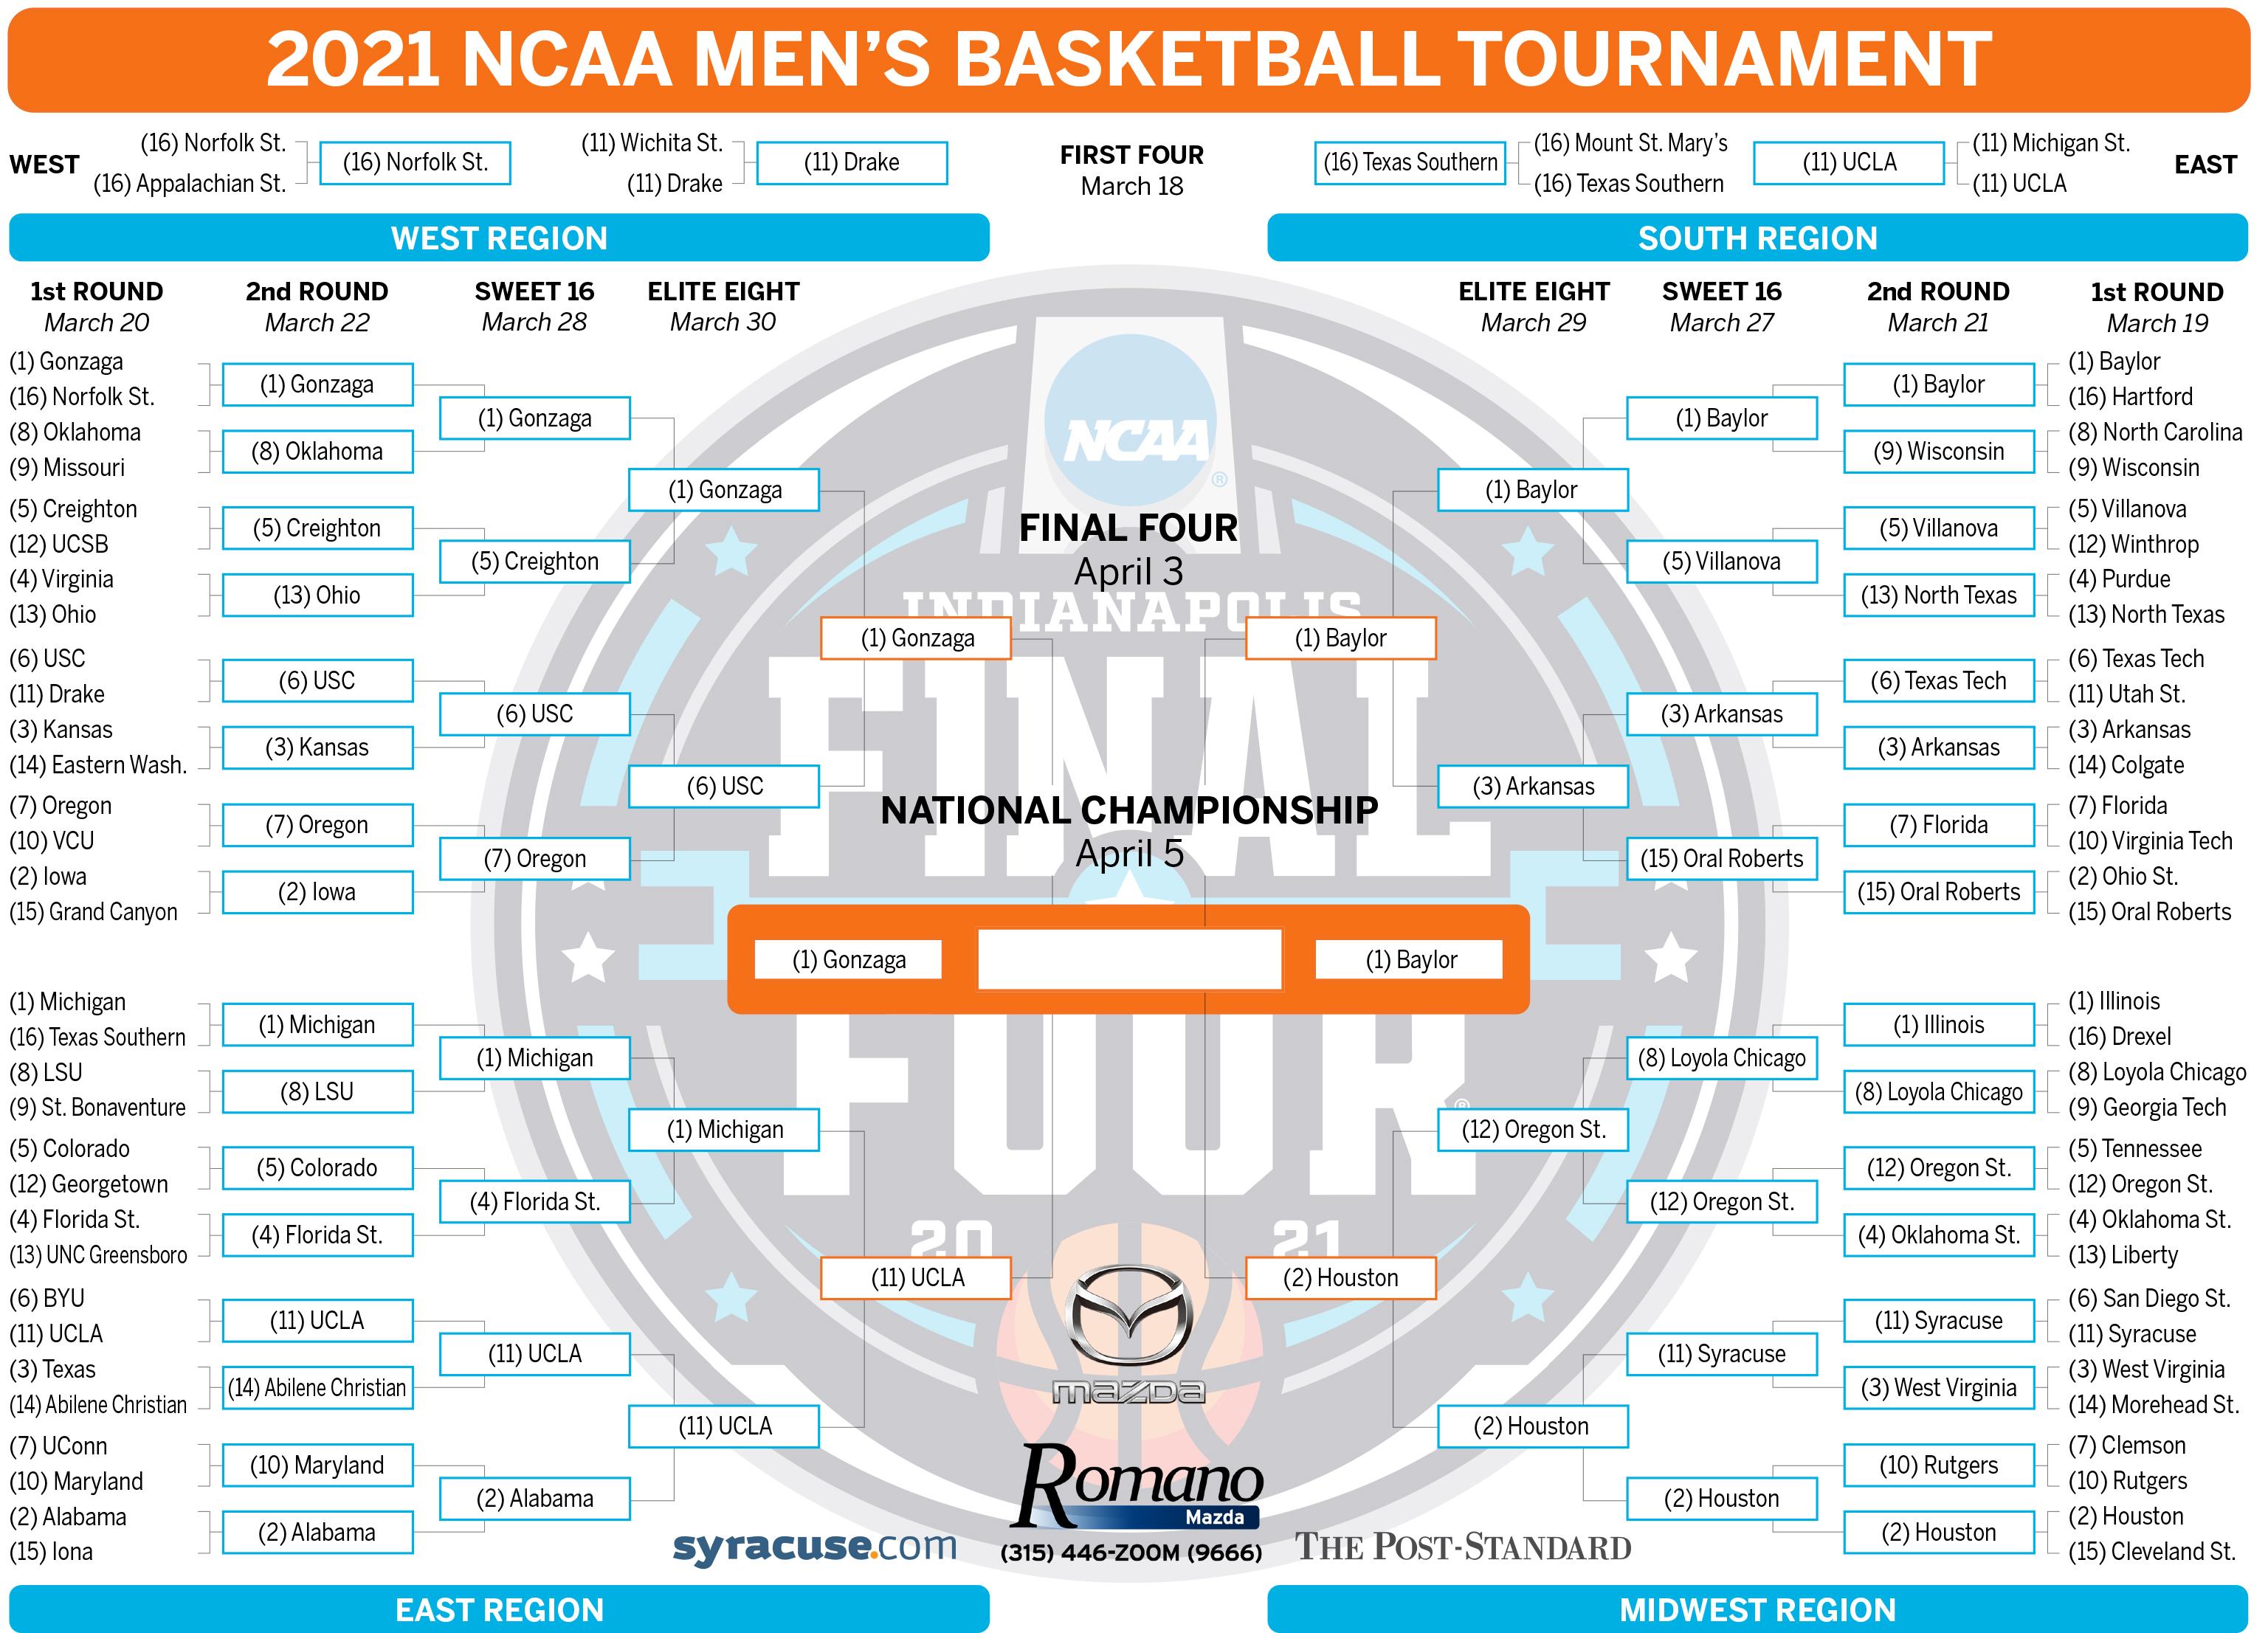 2021 NCAA Men's Basketball Tournament Bracket